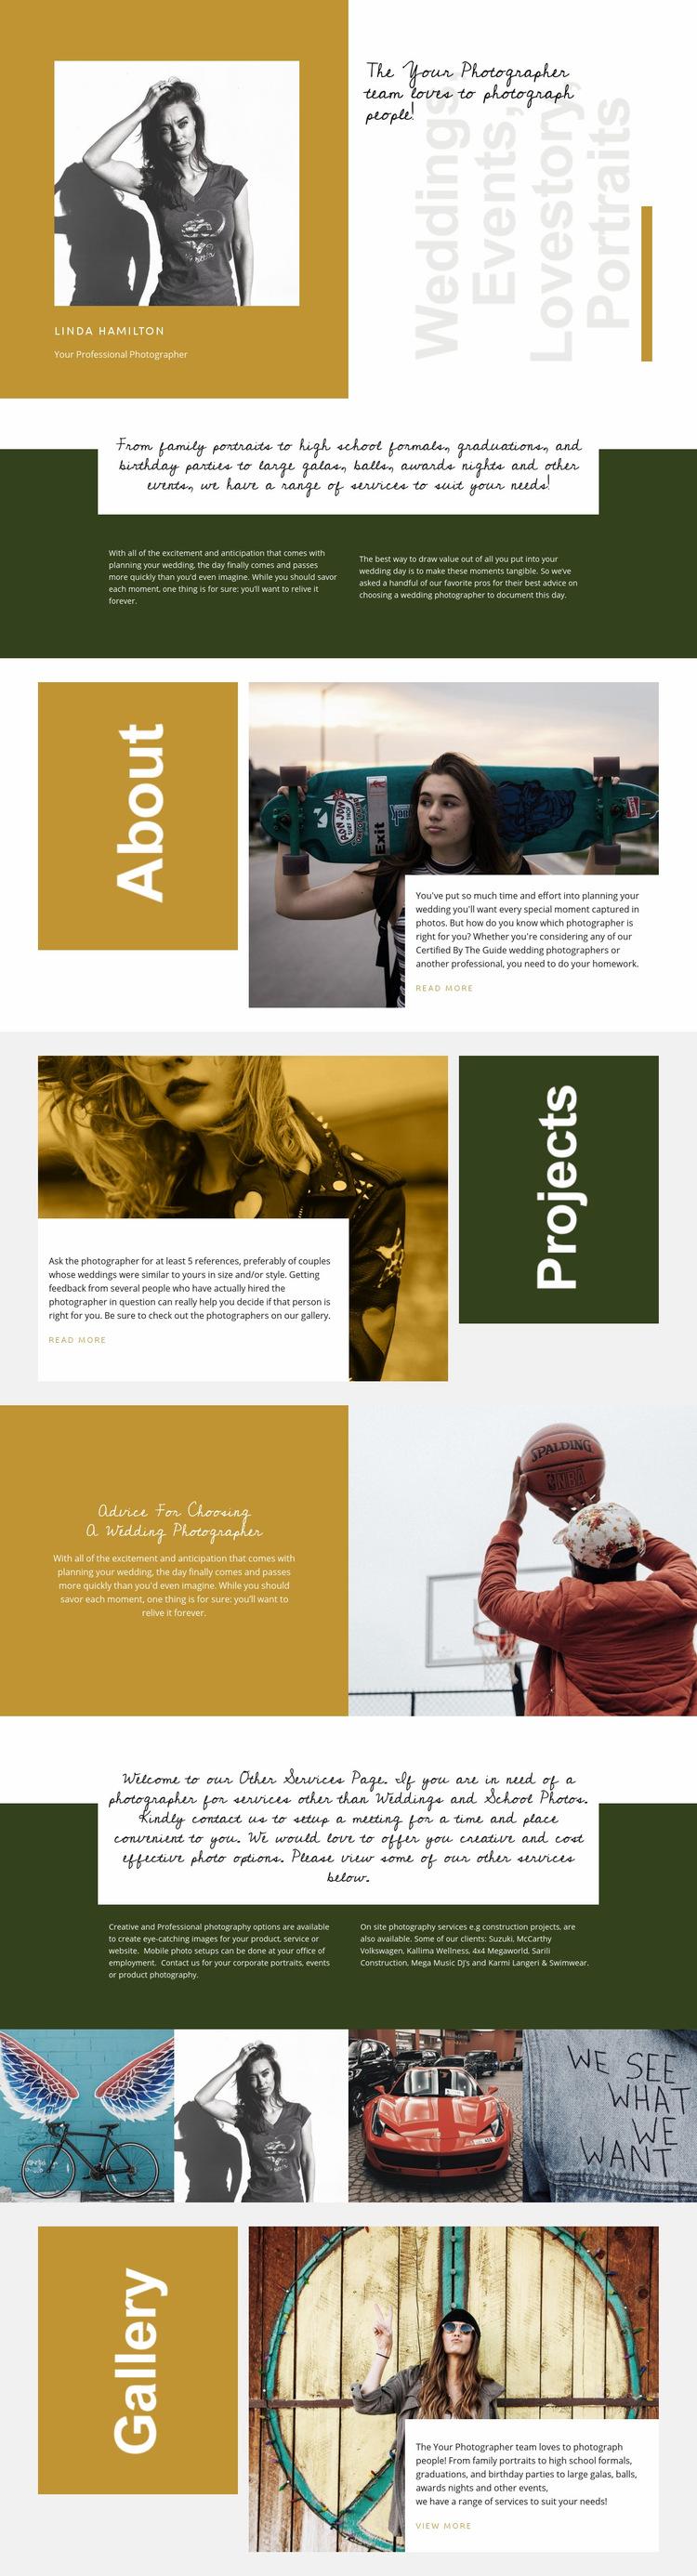 Fashion photography courses Web Page Design